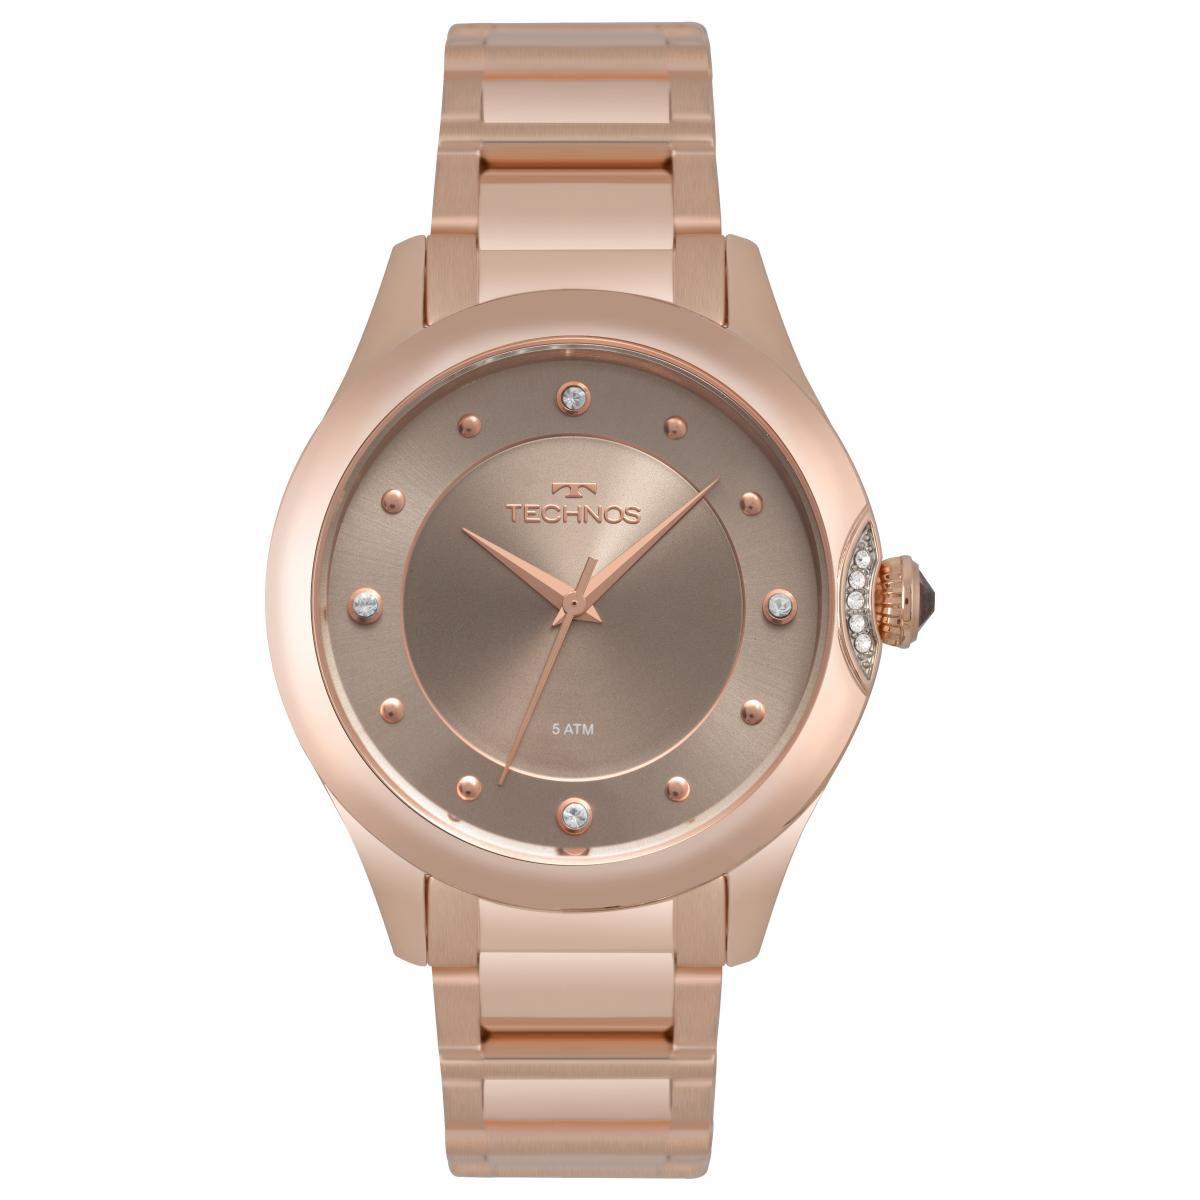 Relógio Feminino Technos Elegance Crystal 2035MQA/5C 38mm Aço Rosê